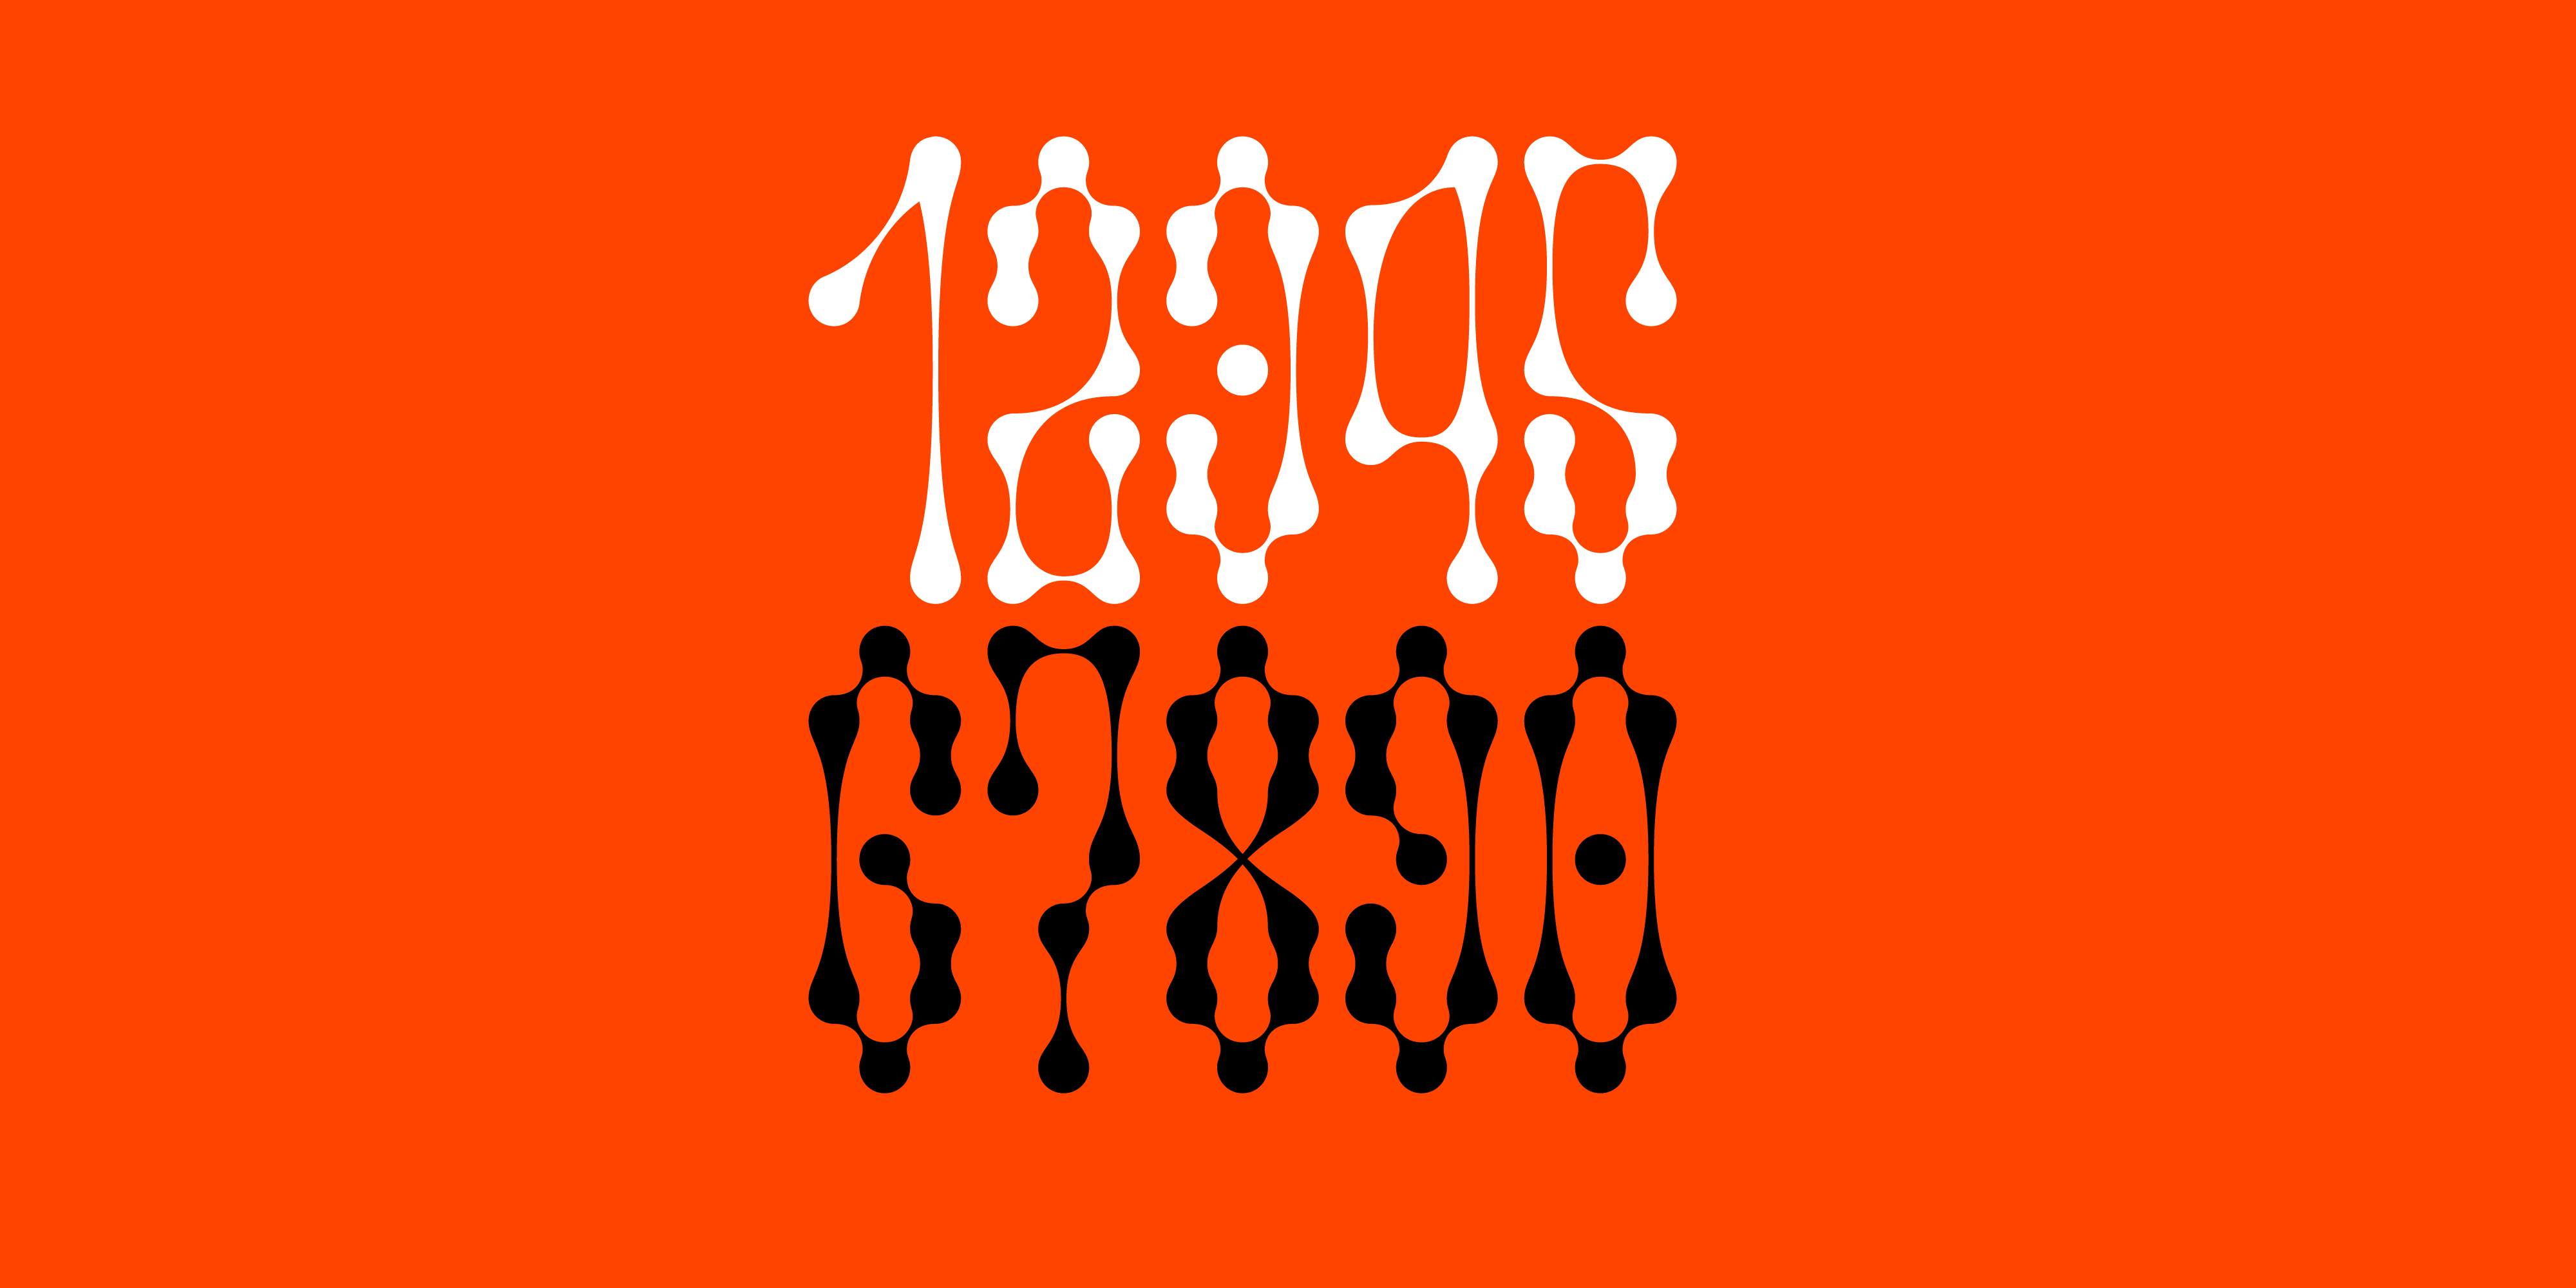 Pivot | The Designers Foundry